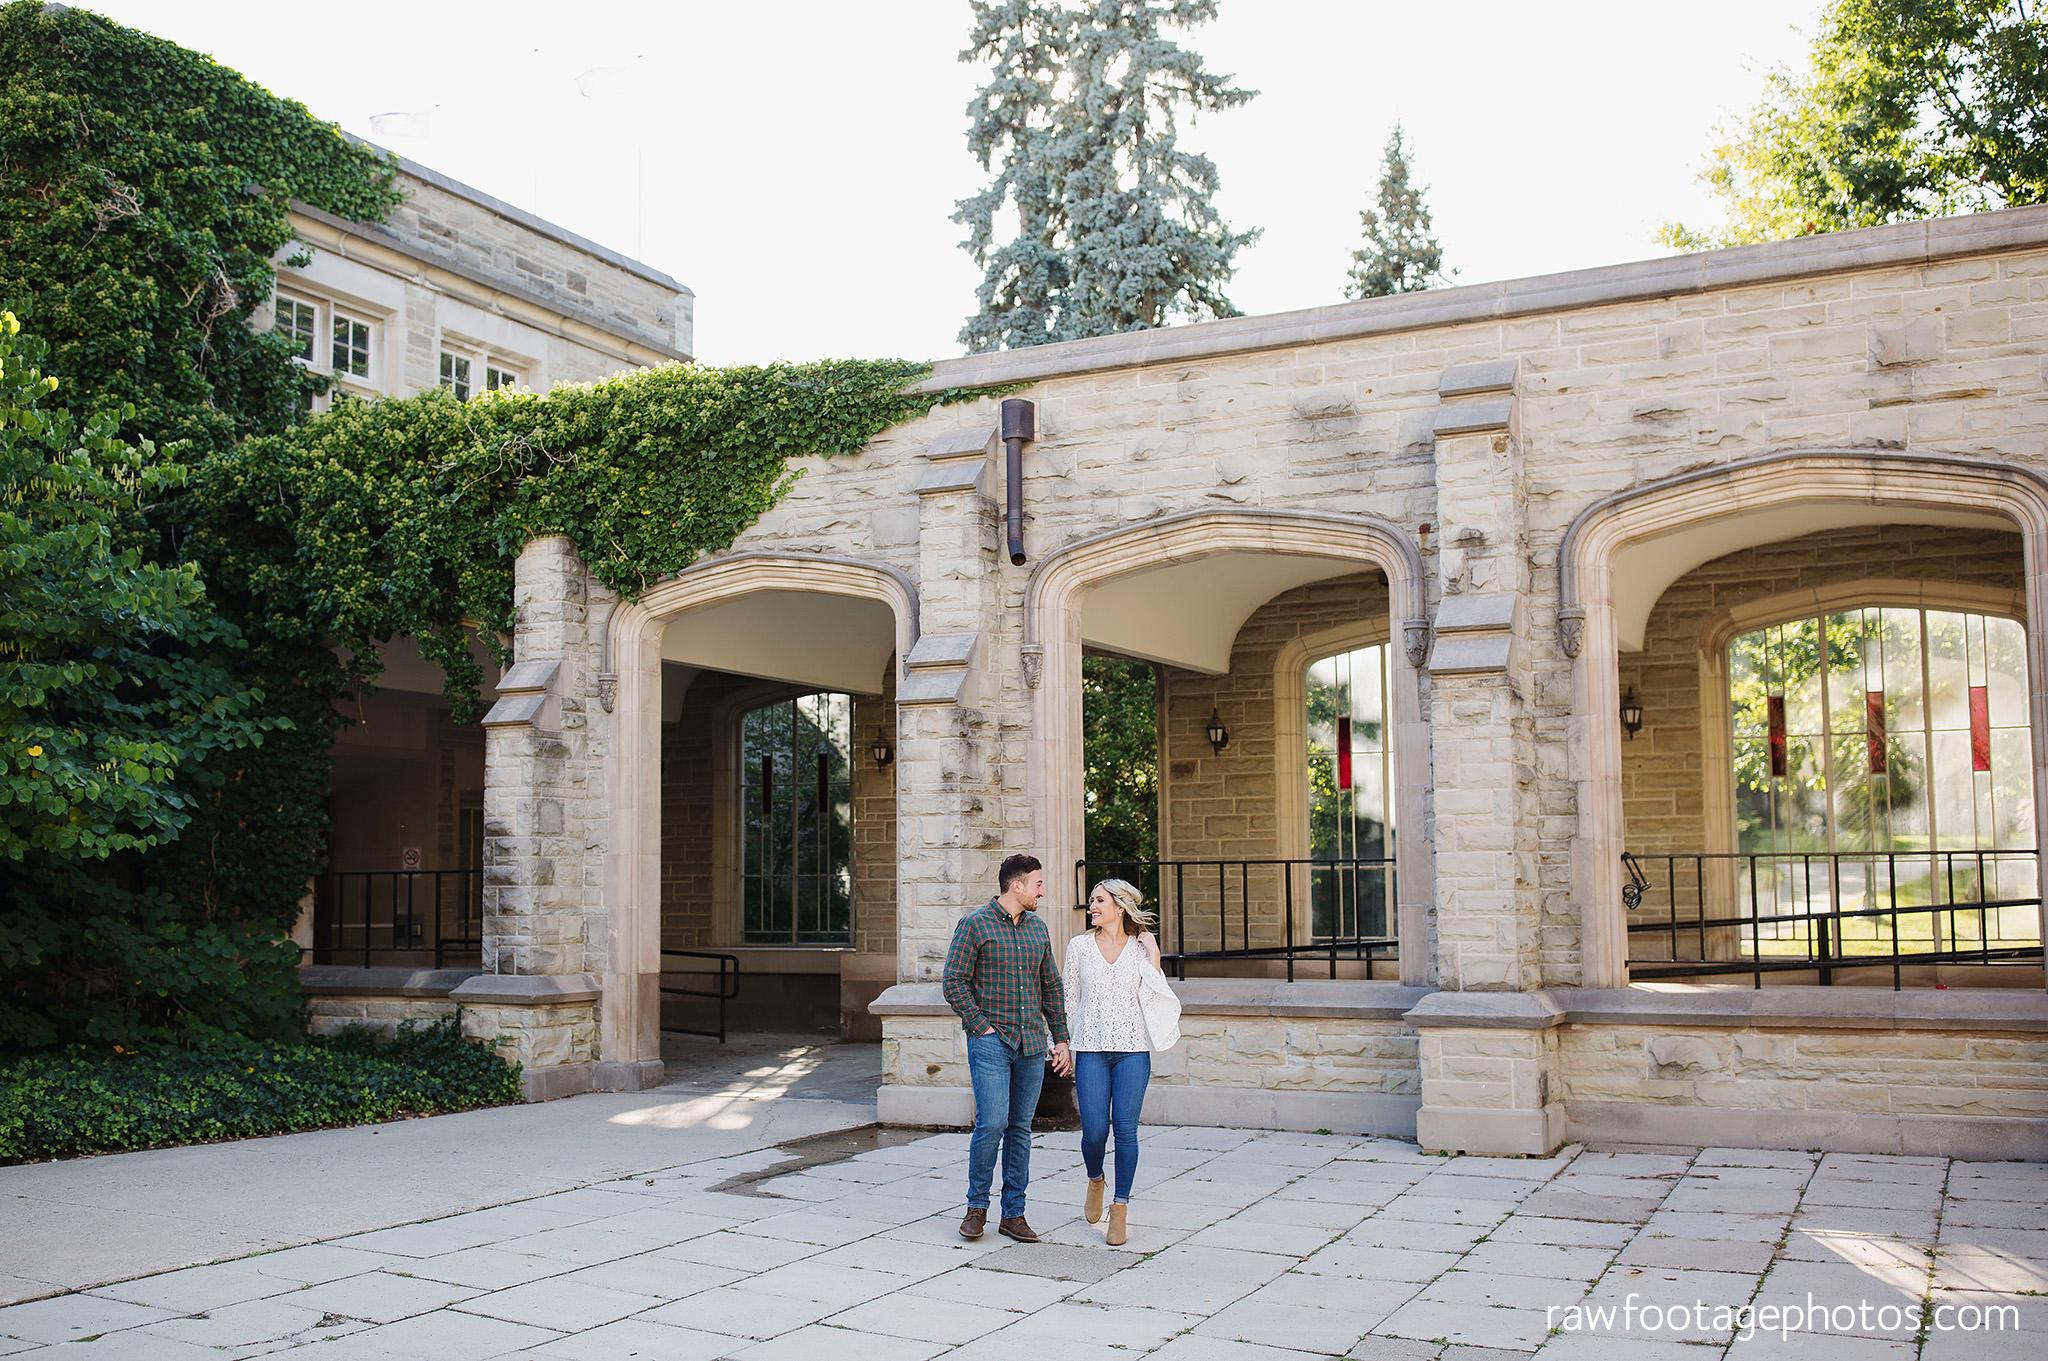 london_ontario_wedding_photographer-raw_footage_photography-engagement_session-uwo-campus-gibbons_park-woods004.jpg